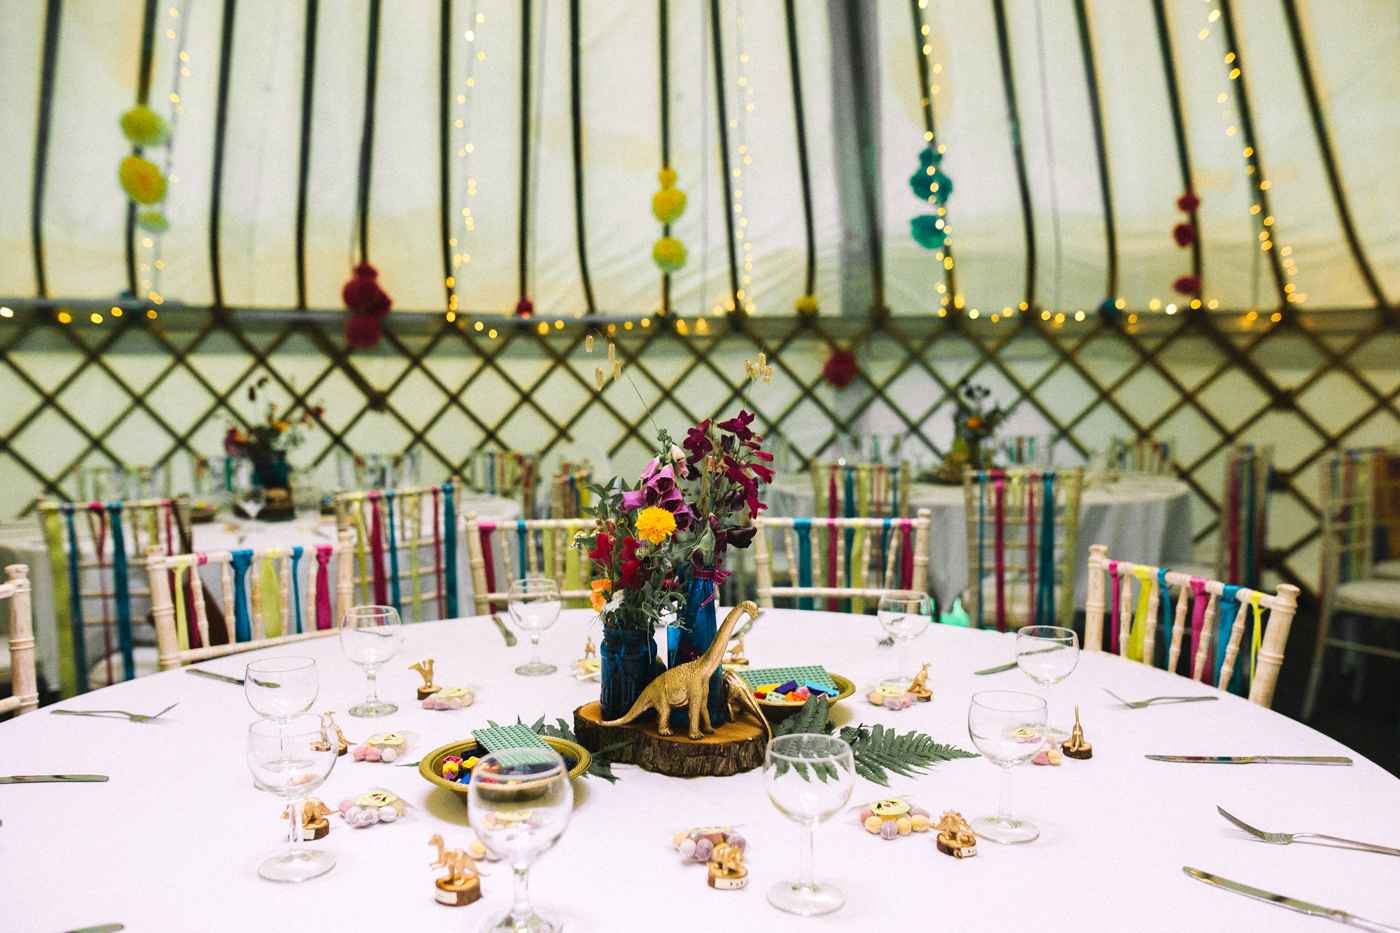 teesside-middlesbrough-north-east-wedding-photographer-creative-wedding-venues-0013.jpg